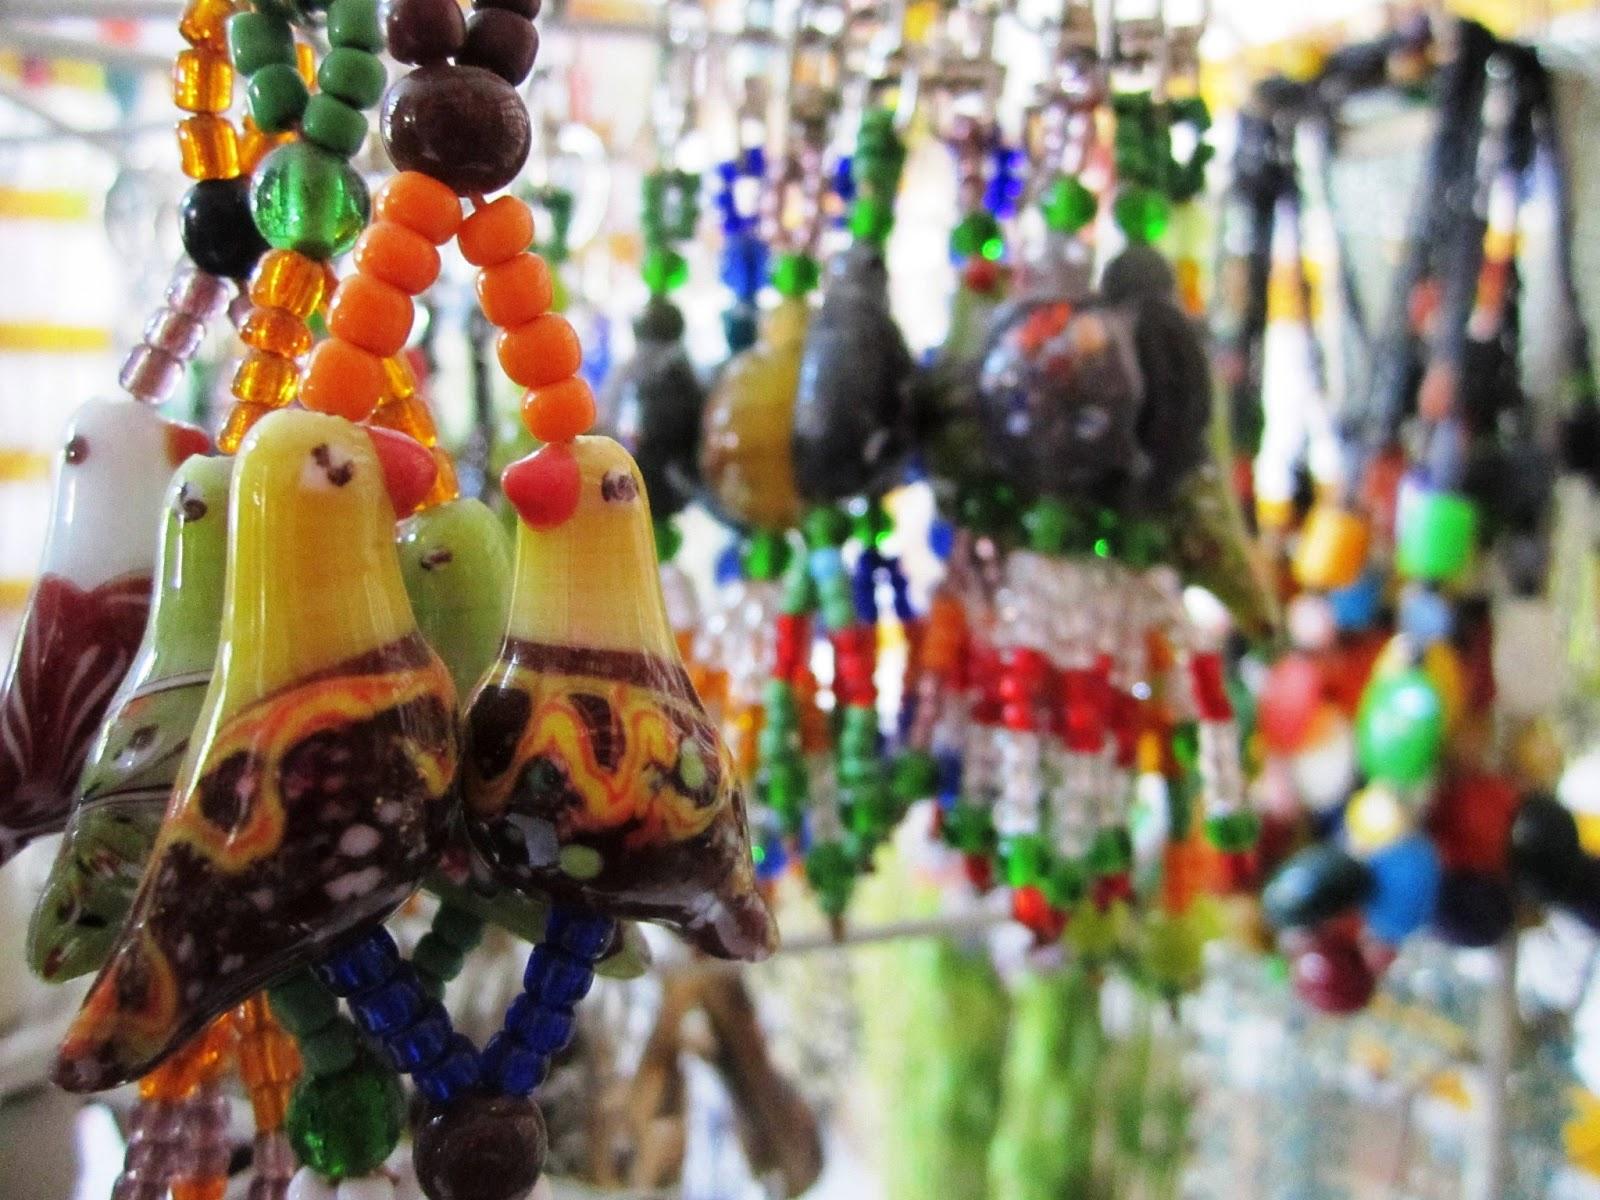 Jombang City Guide Kerajinan Manik Manik Kaca Jombang